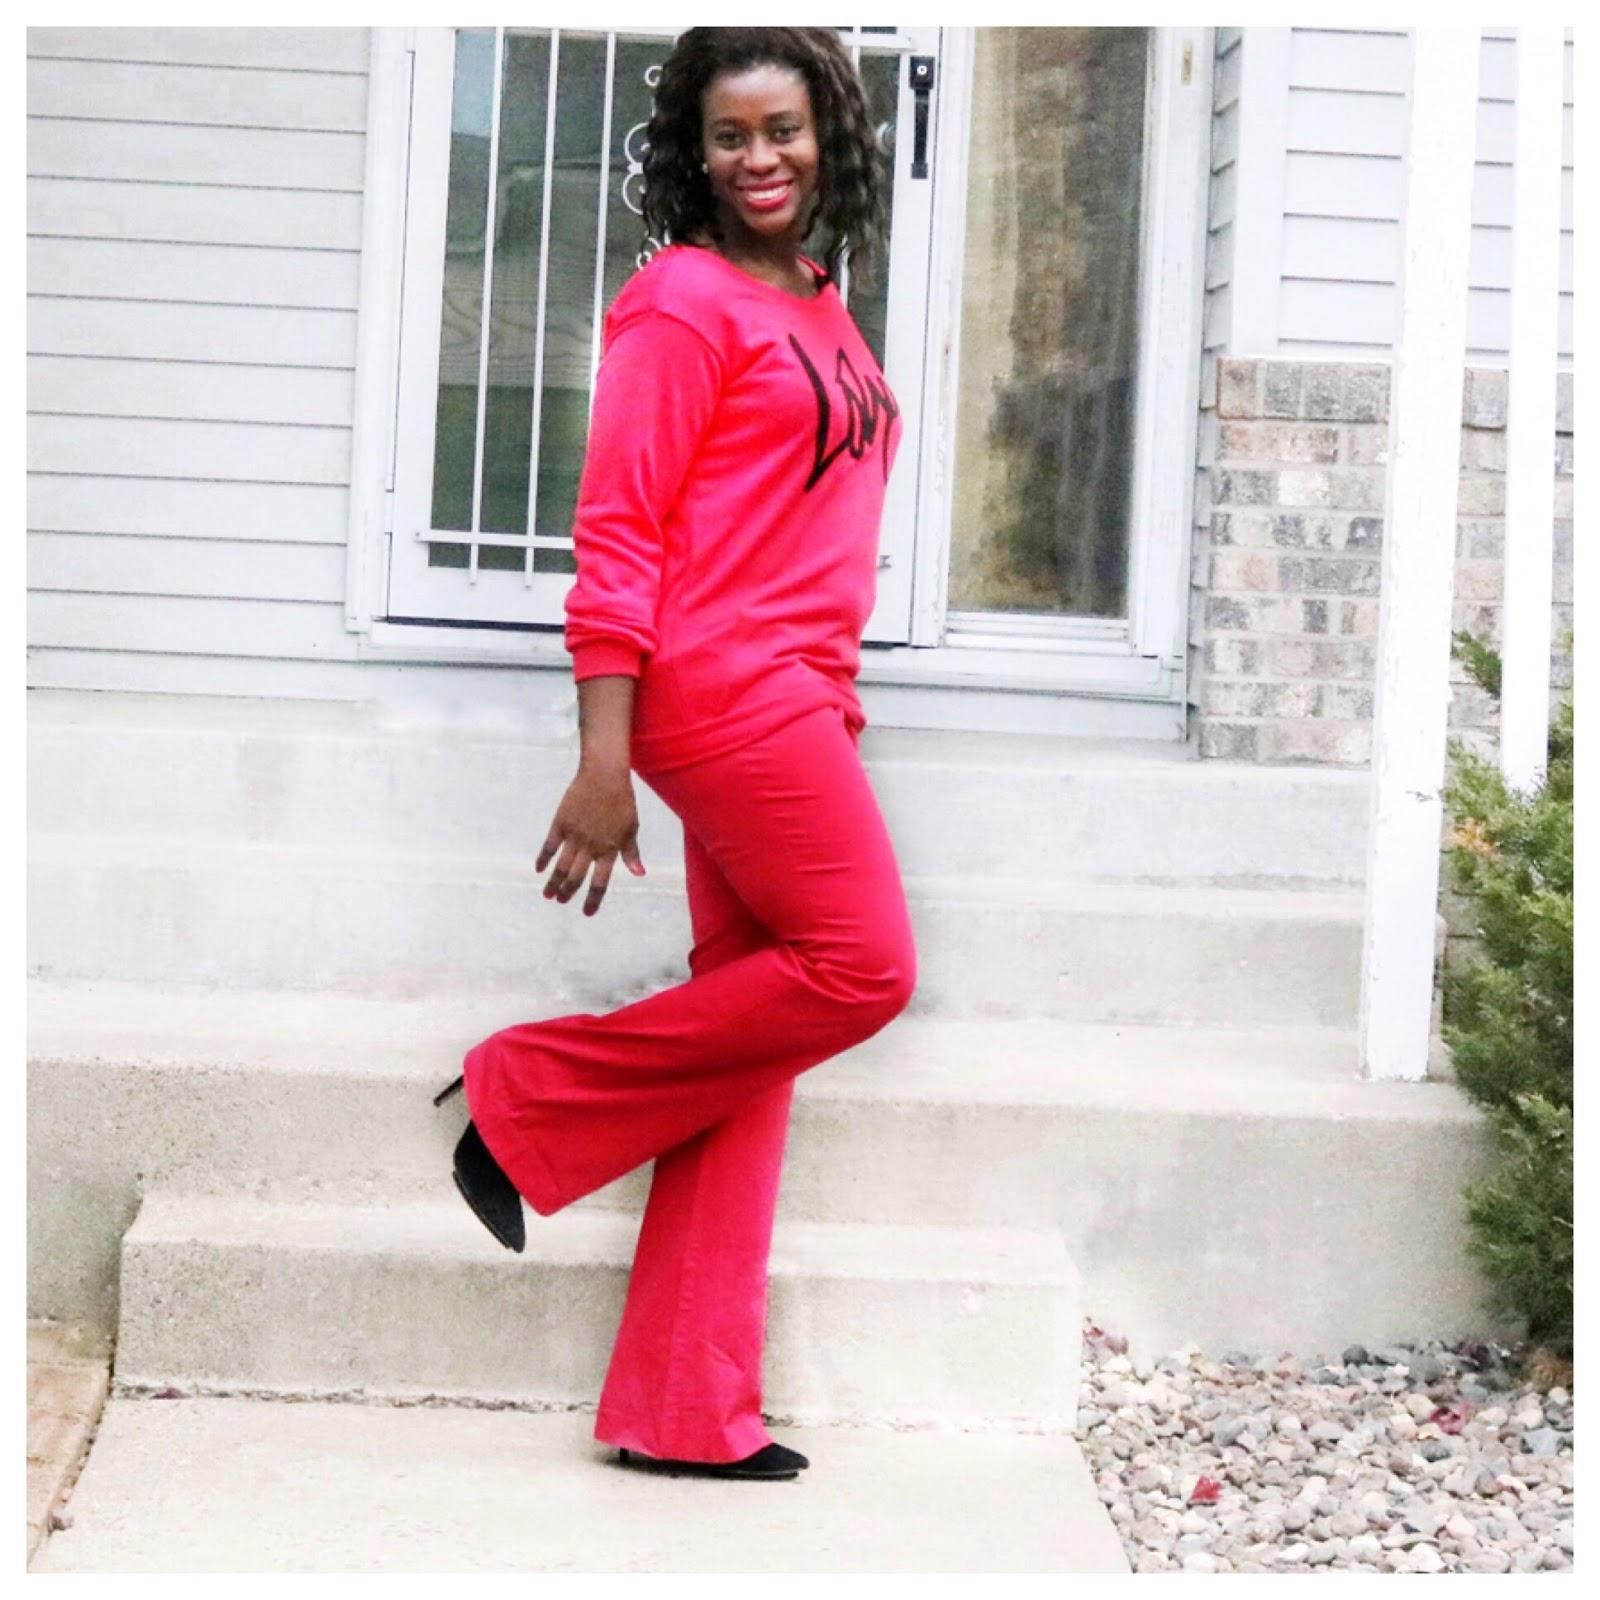 Fashion Beauty Zone: Beauty's Fashion Zone: Red Sweat Shirt + Red Trouser = LOVE